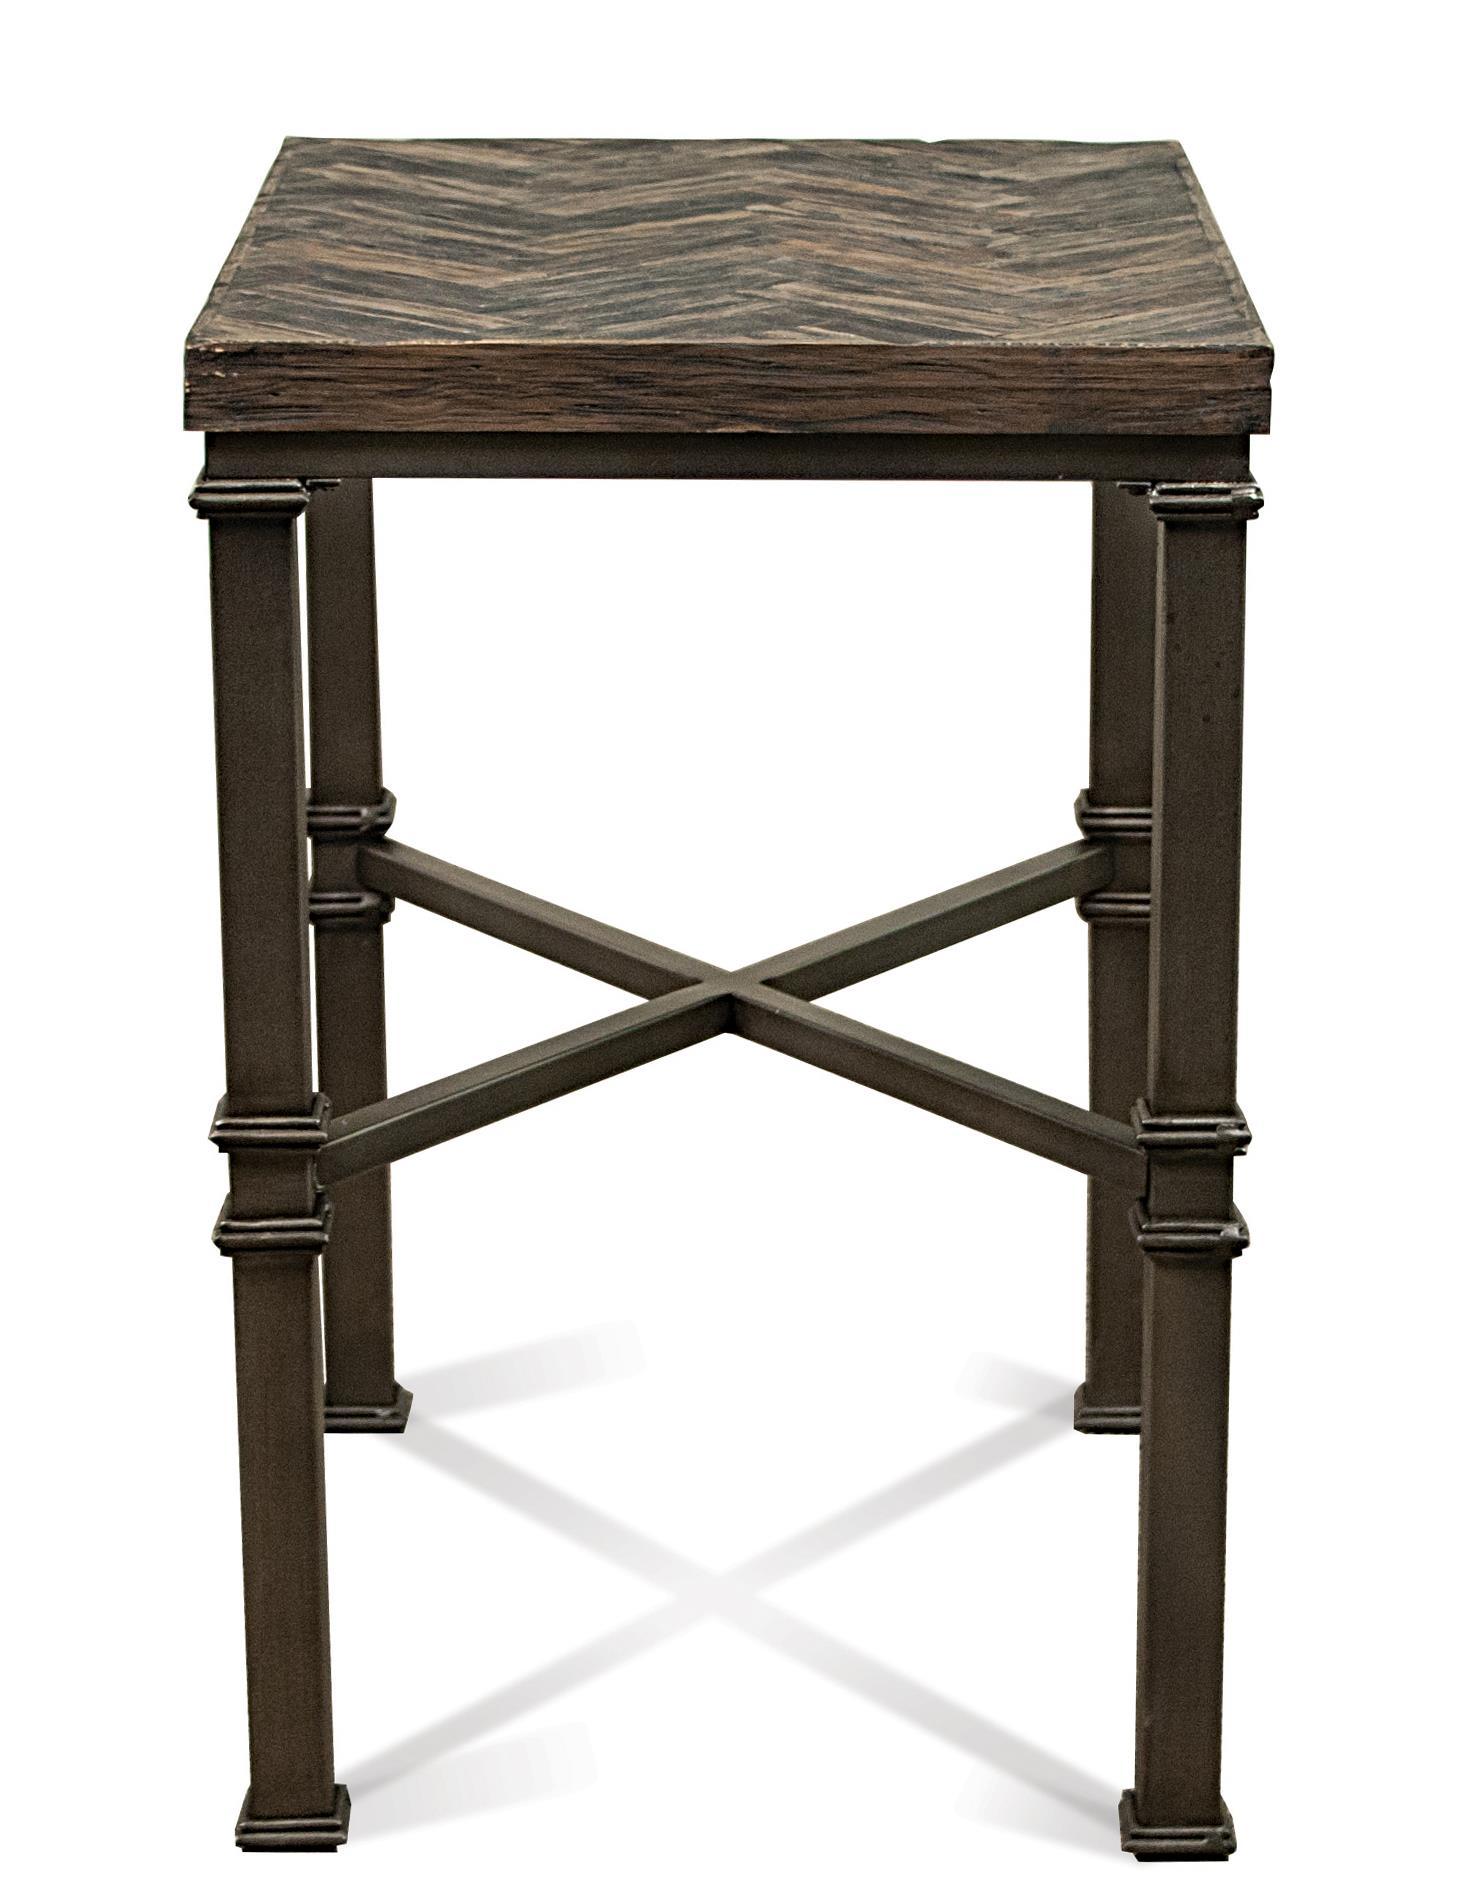 Riverside Furniture Bridlewood Chairside Table  - Item Number: 22212